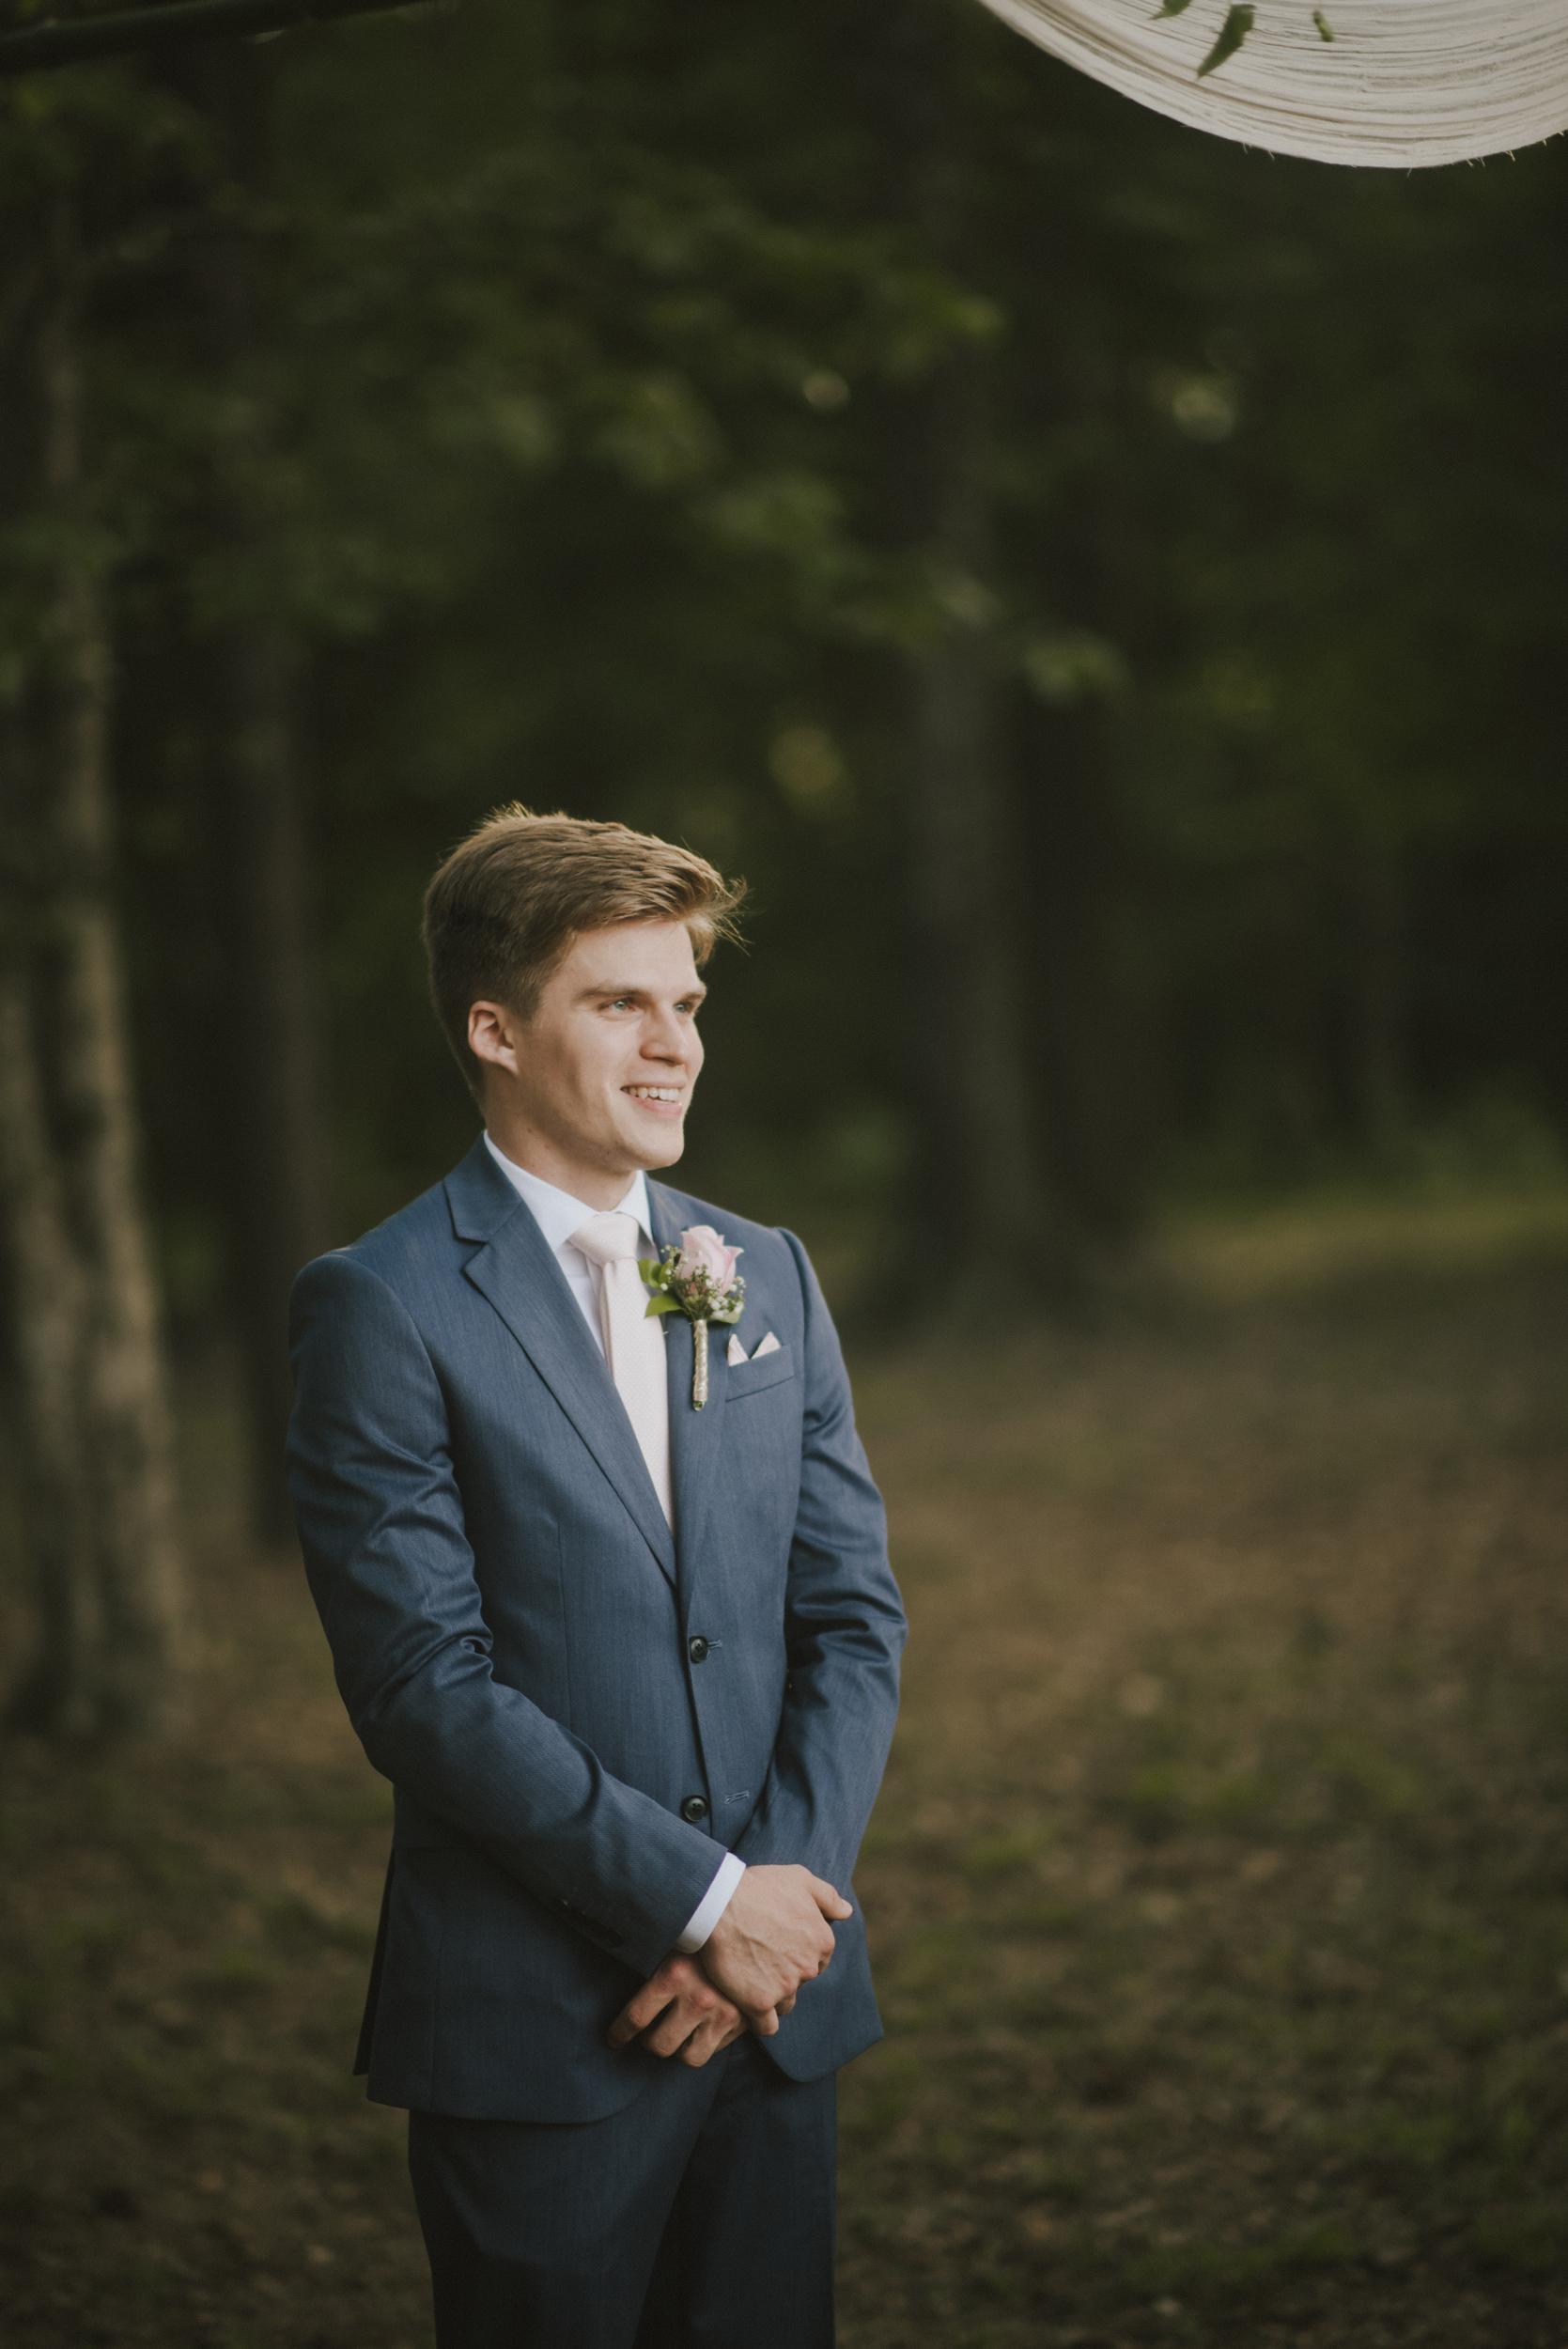 ofRen_weddingphotographer-127.jpg